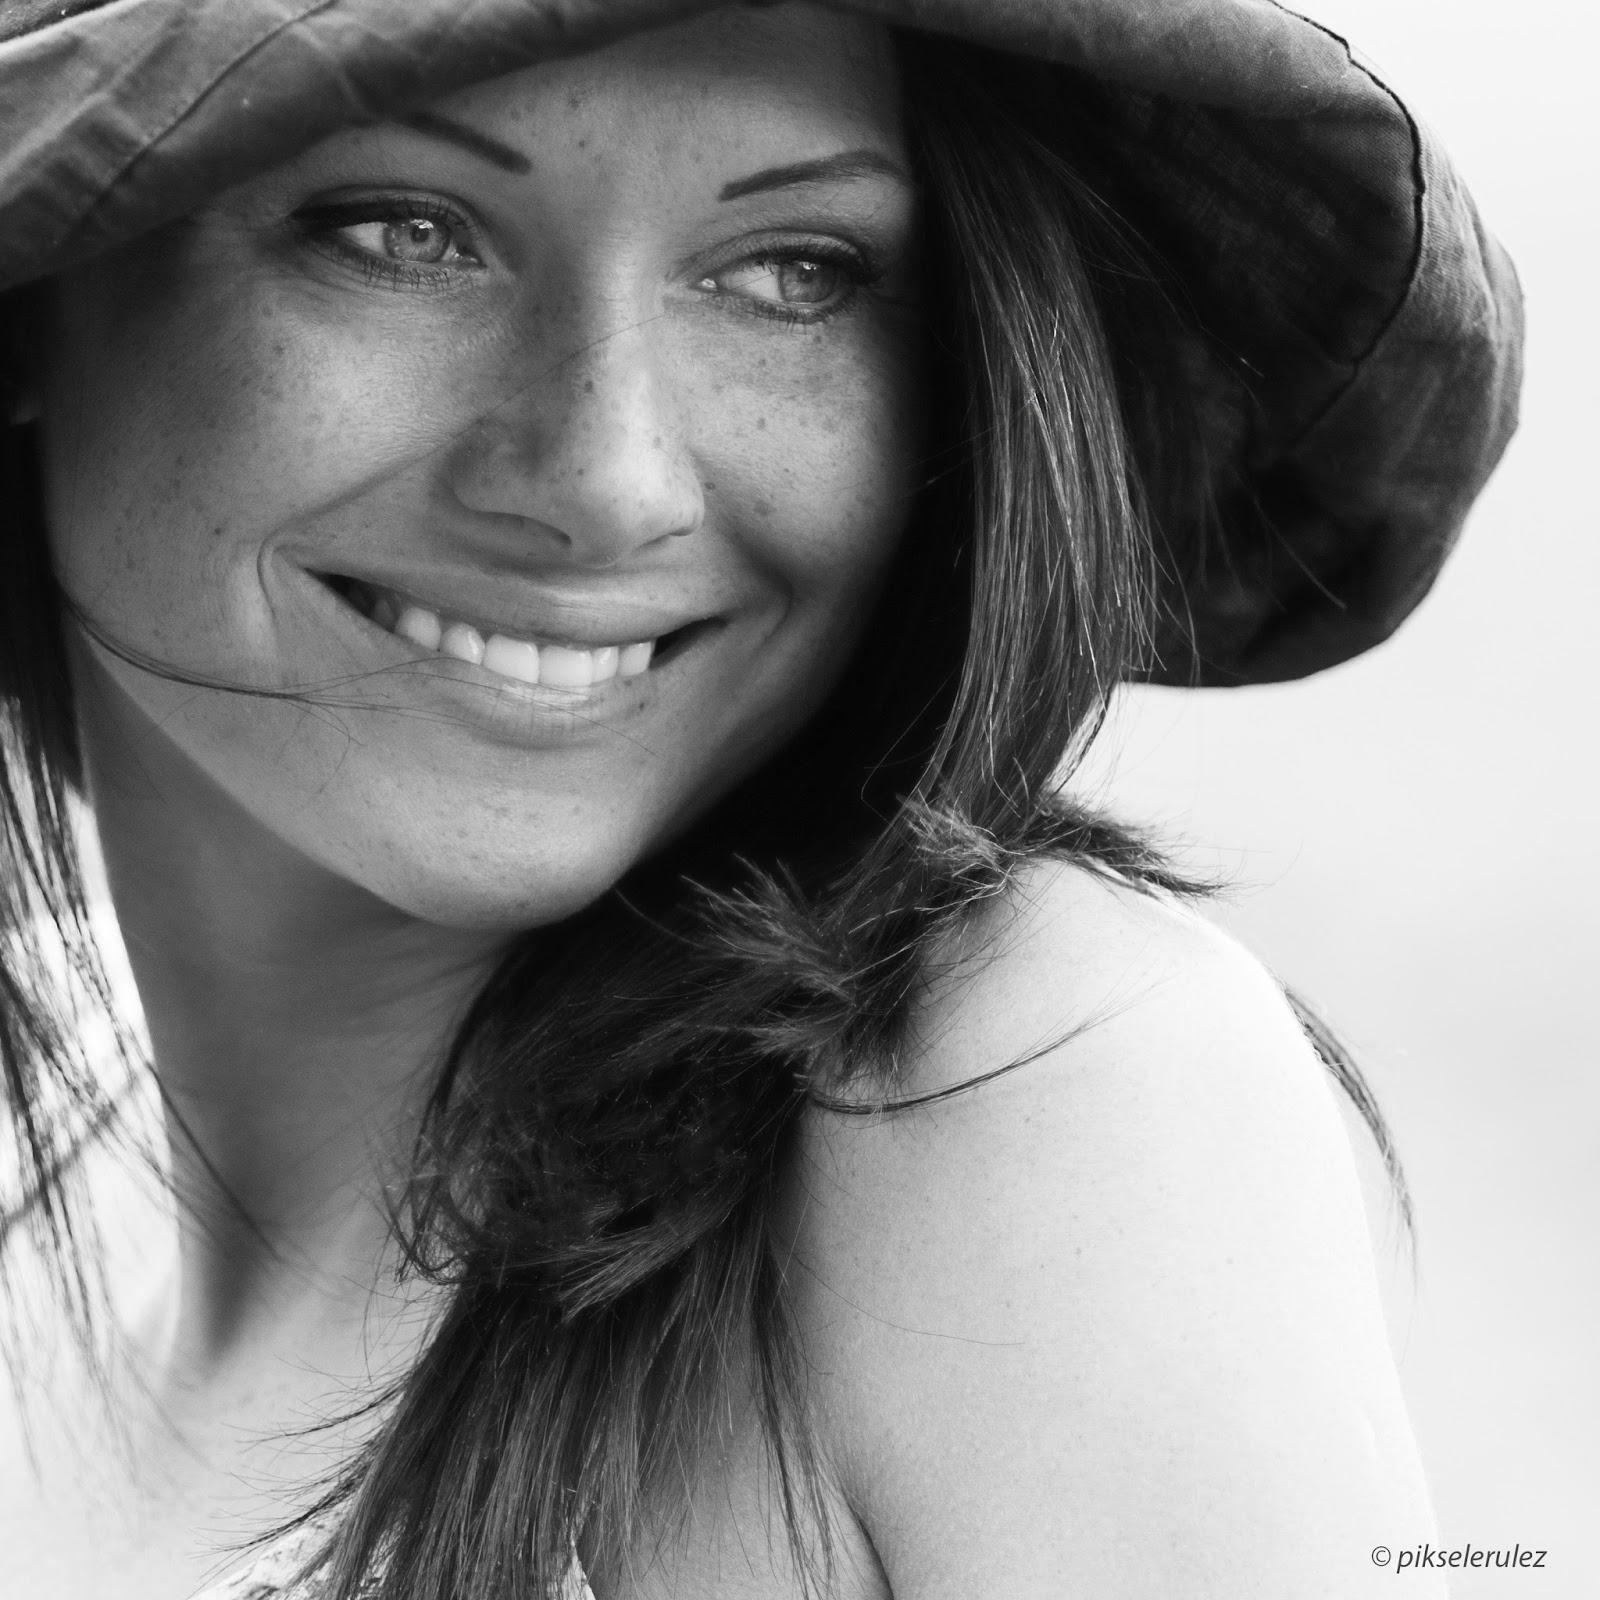 people, portraits, Poland, Agata Raszke, portret, kobieta, black&white, freckles, piegi,